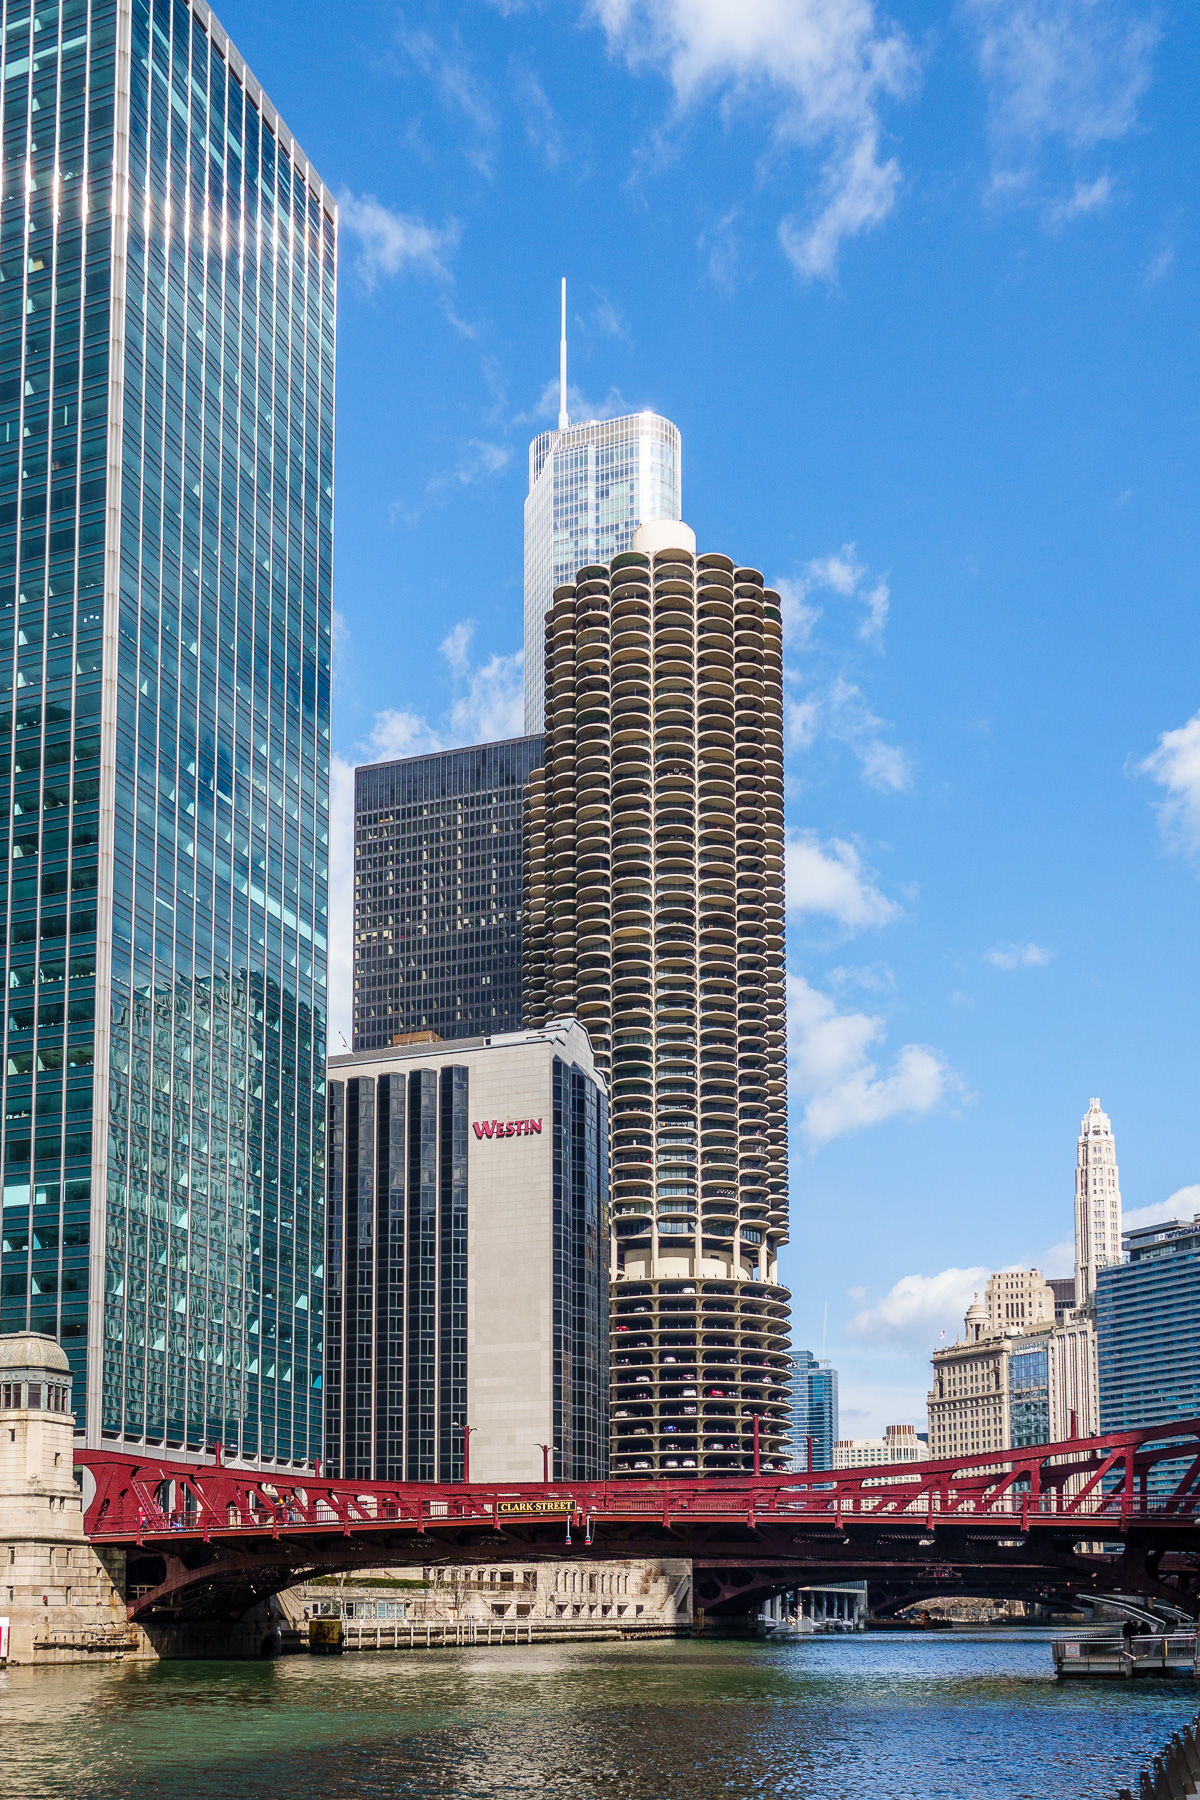 20180331 Saturday Afternoon in Chicago DSC-RX10M4 _HWT1053